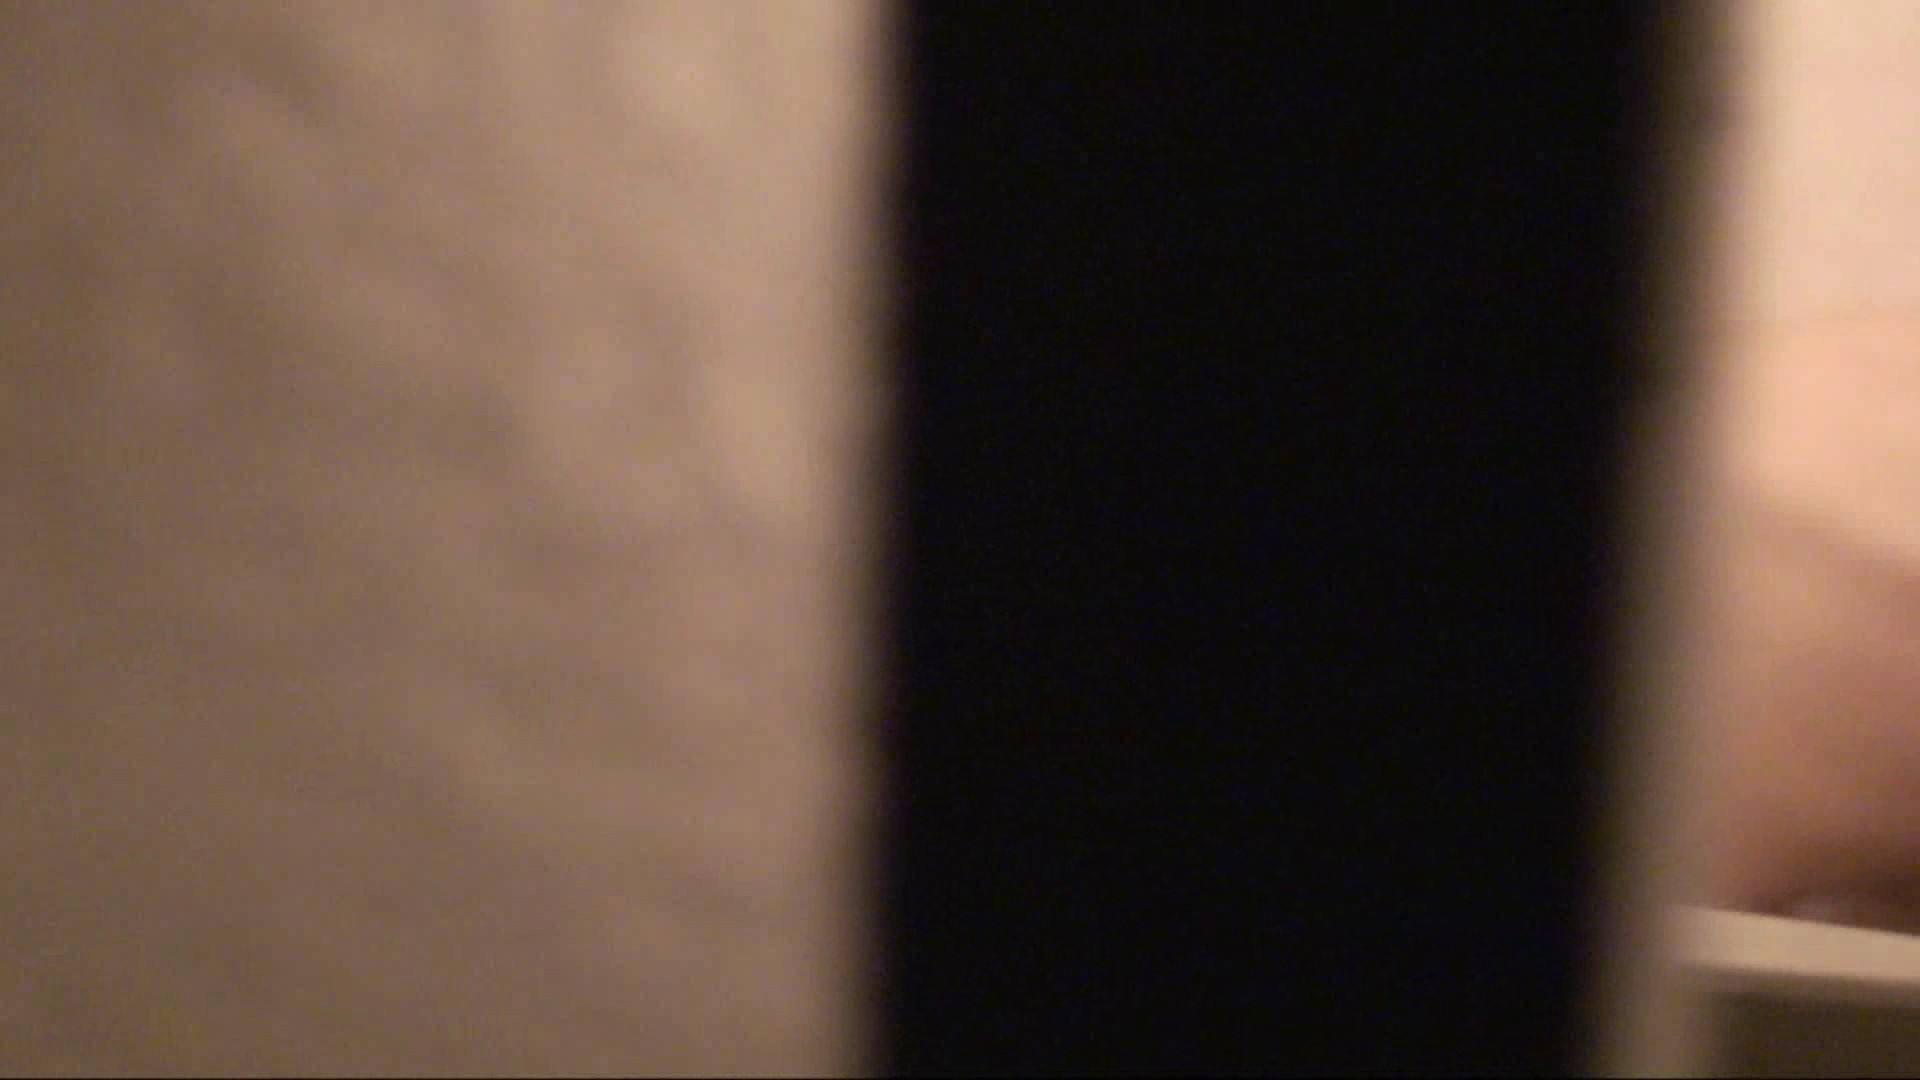 vol.01必見!白肌嬢の乳首が丸見え。極上美人のすっぴん顔をハイビジョンで! 覗き | 全身丸見え  43連発 34